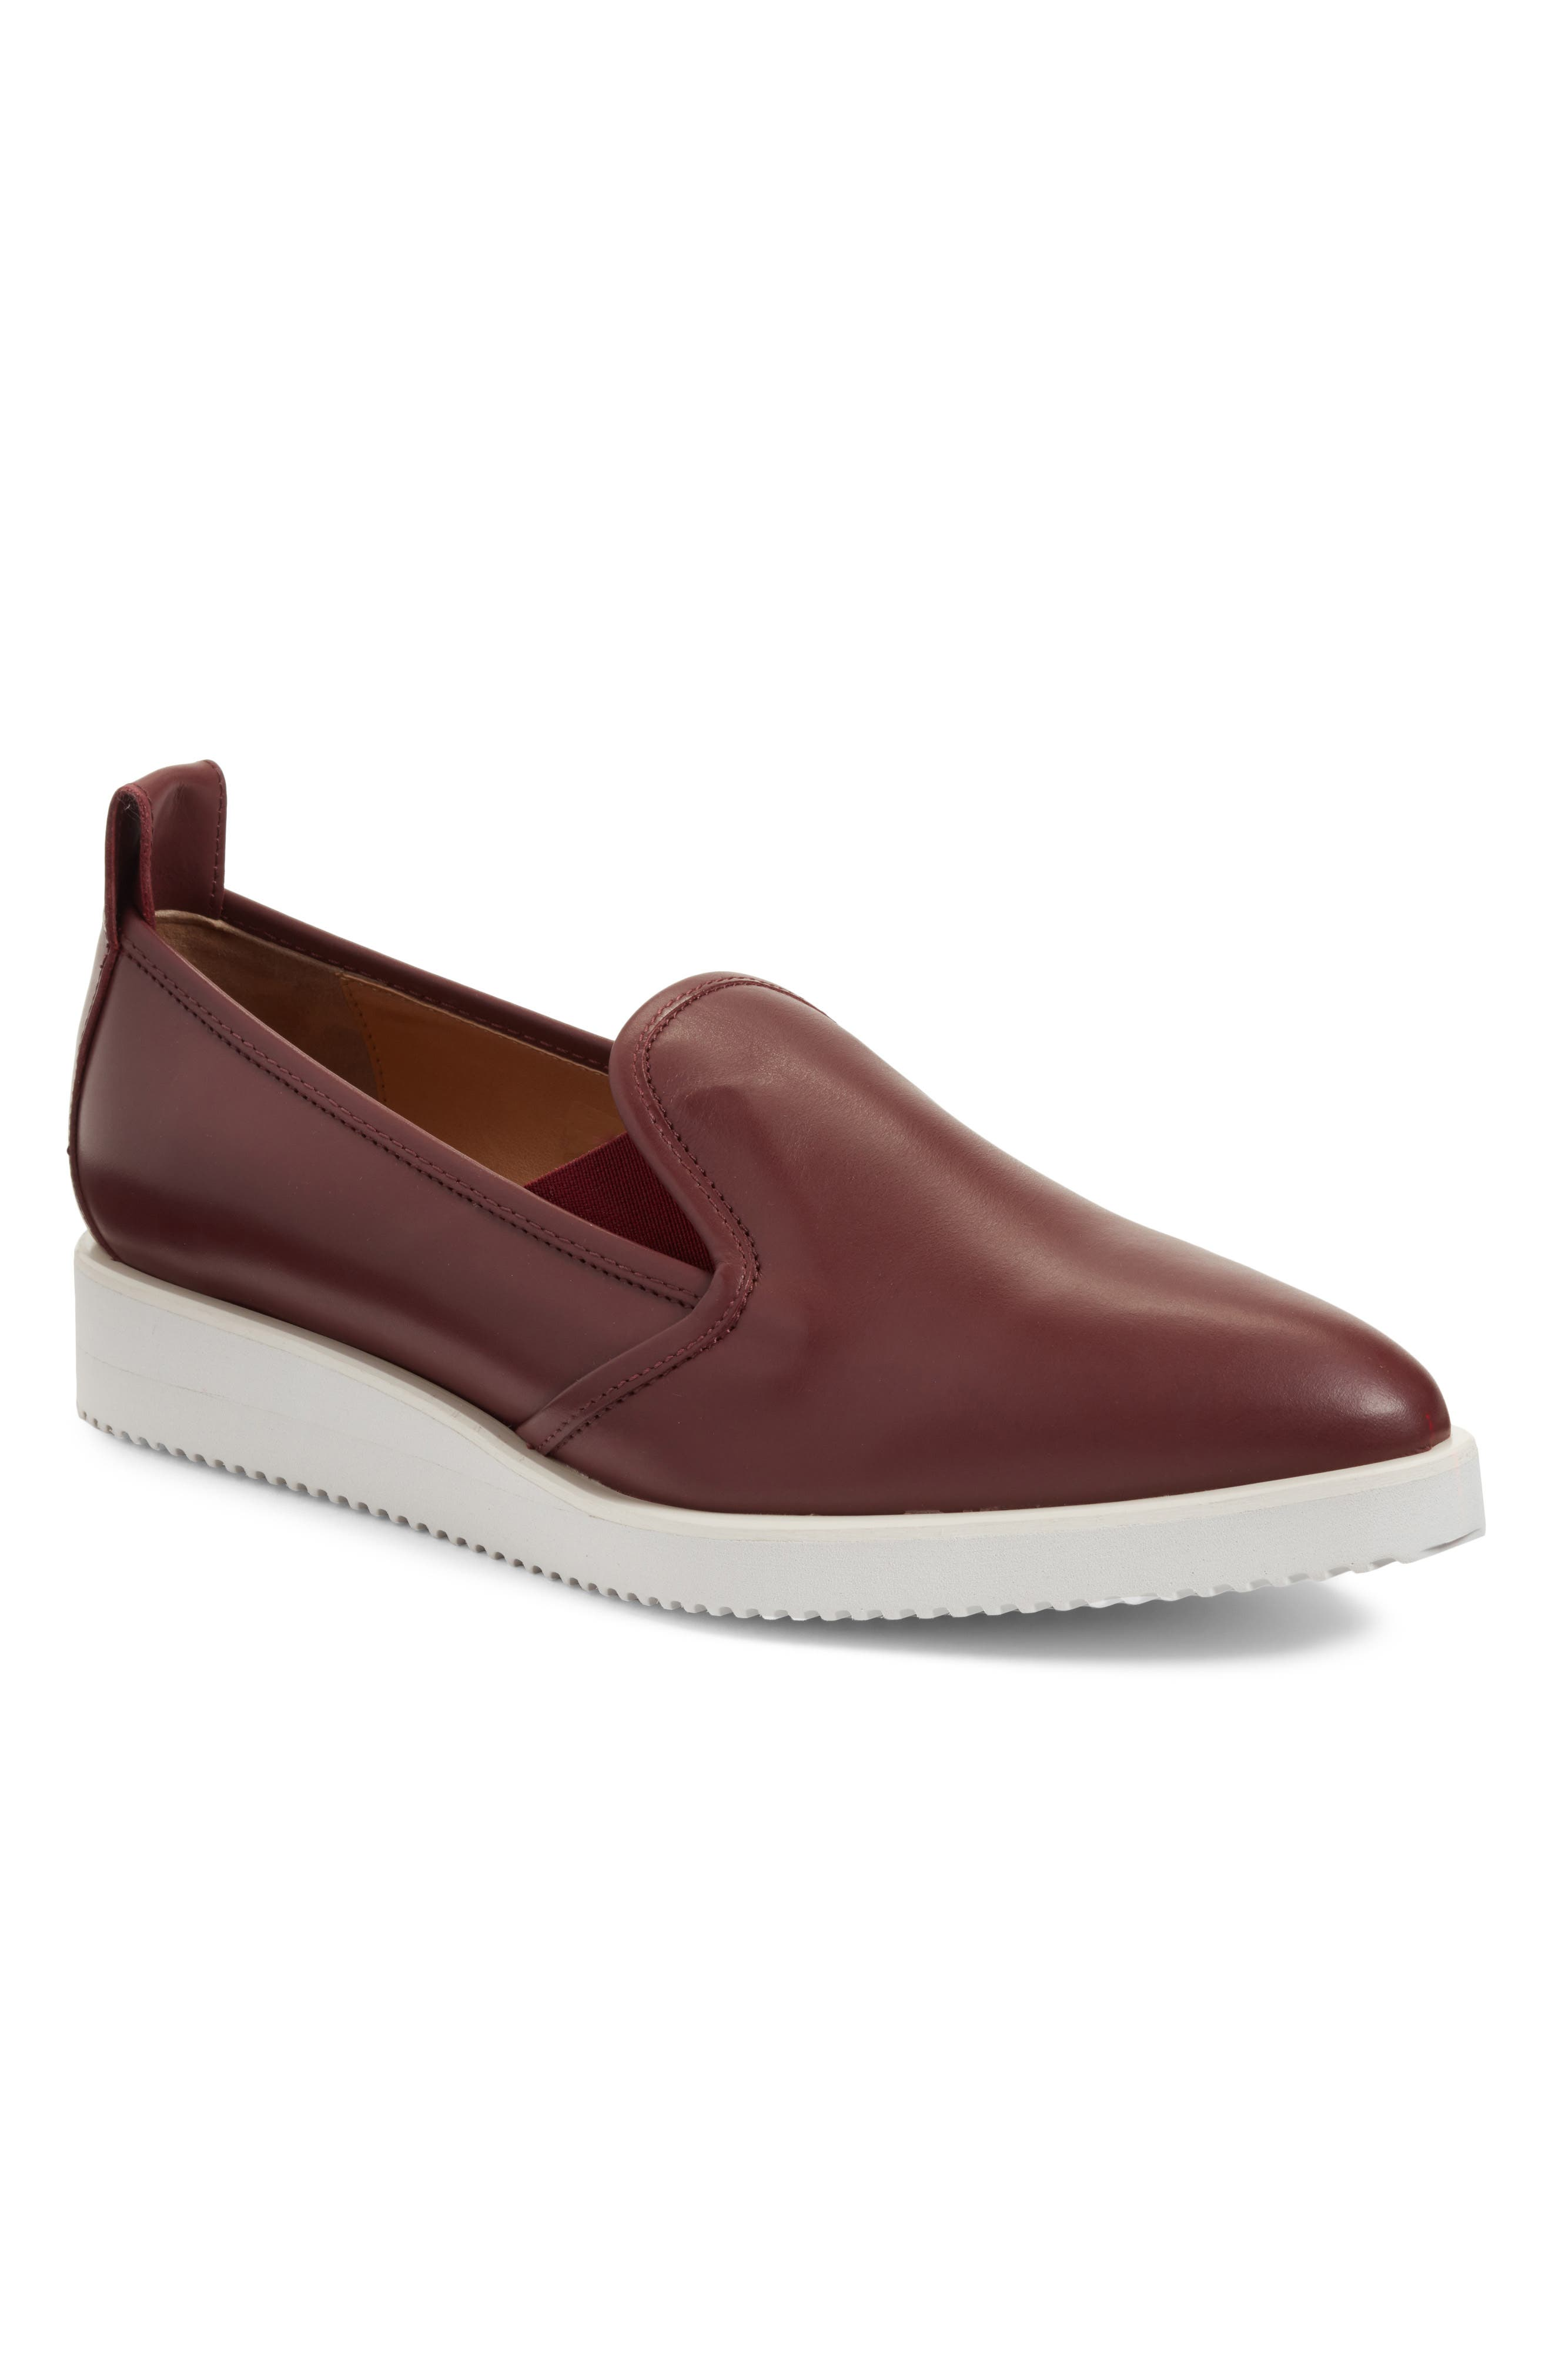 Alternate Image 1 Selected - Everlane The Leather Street Shoe (Women)